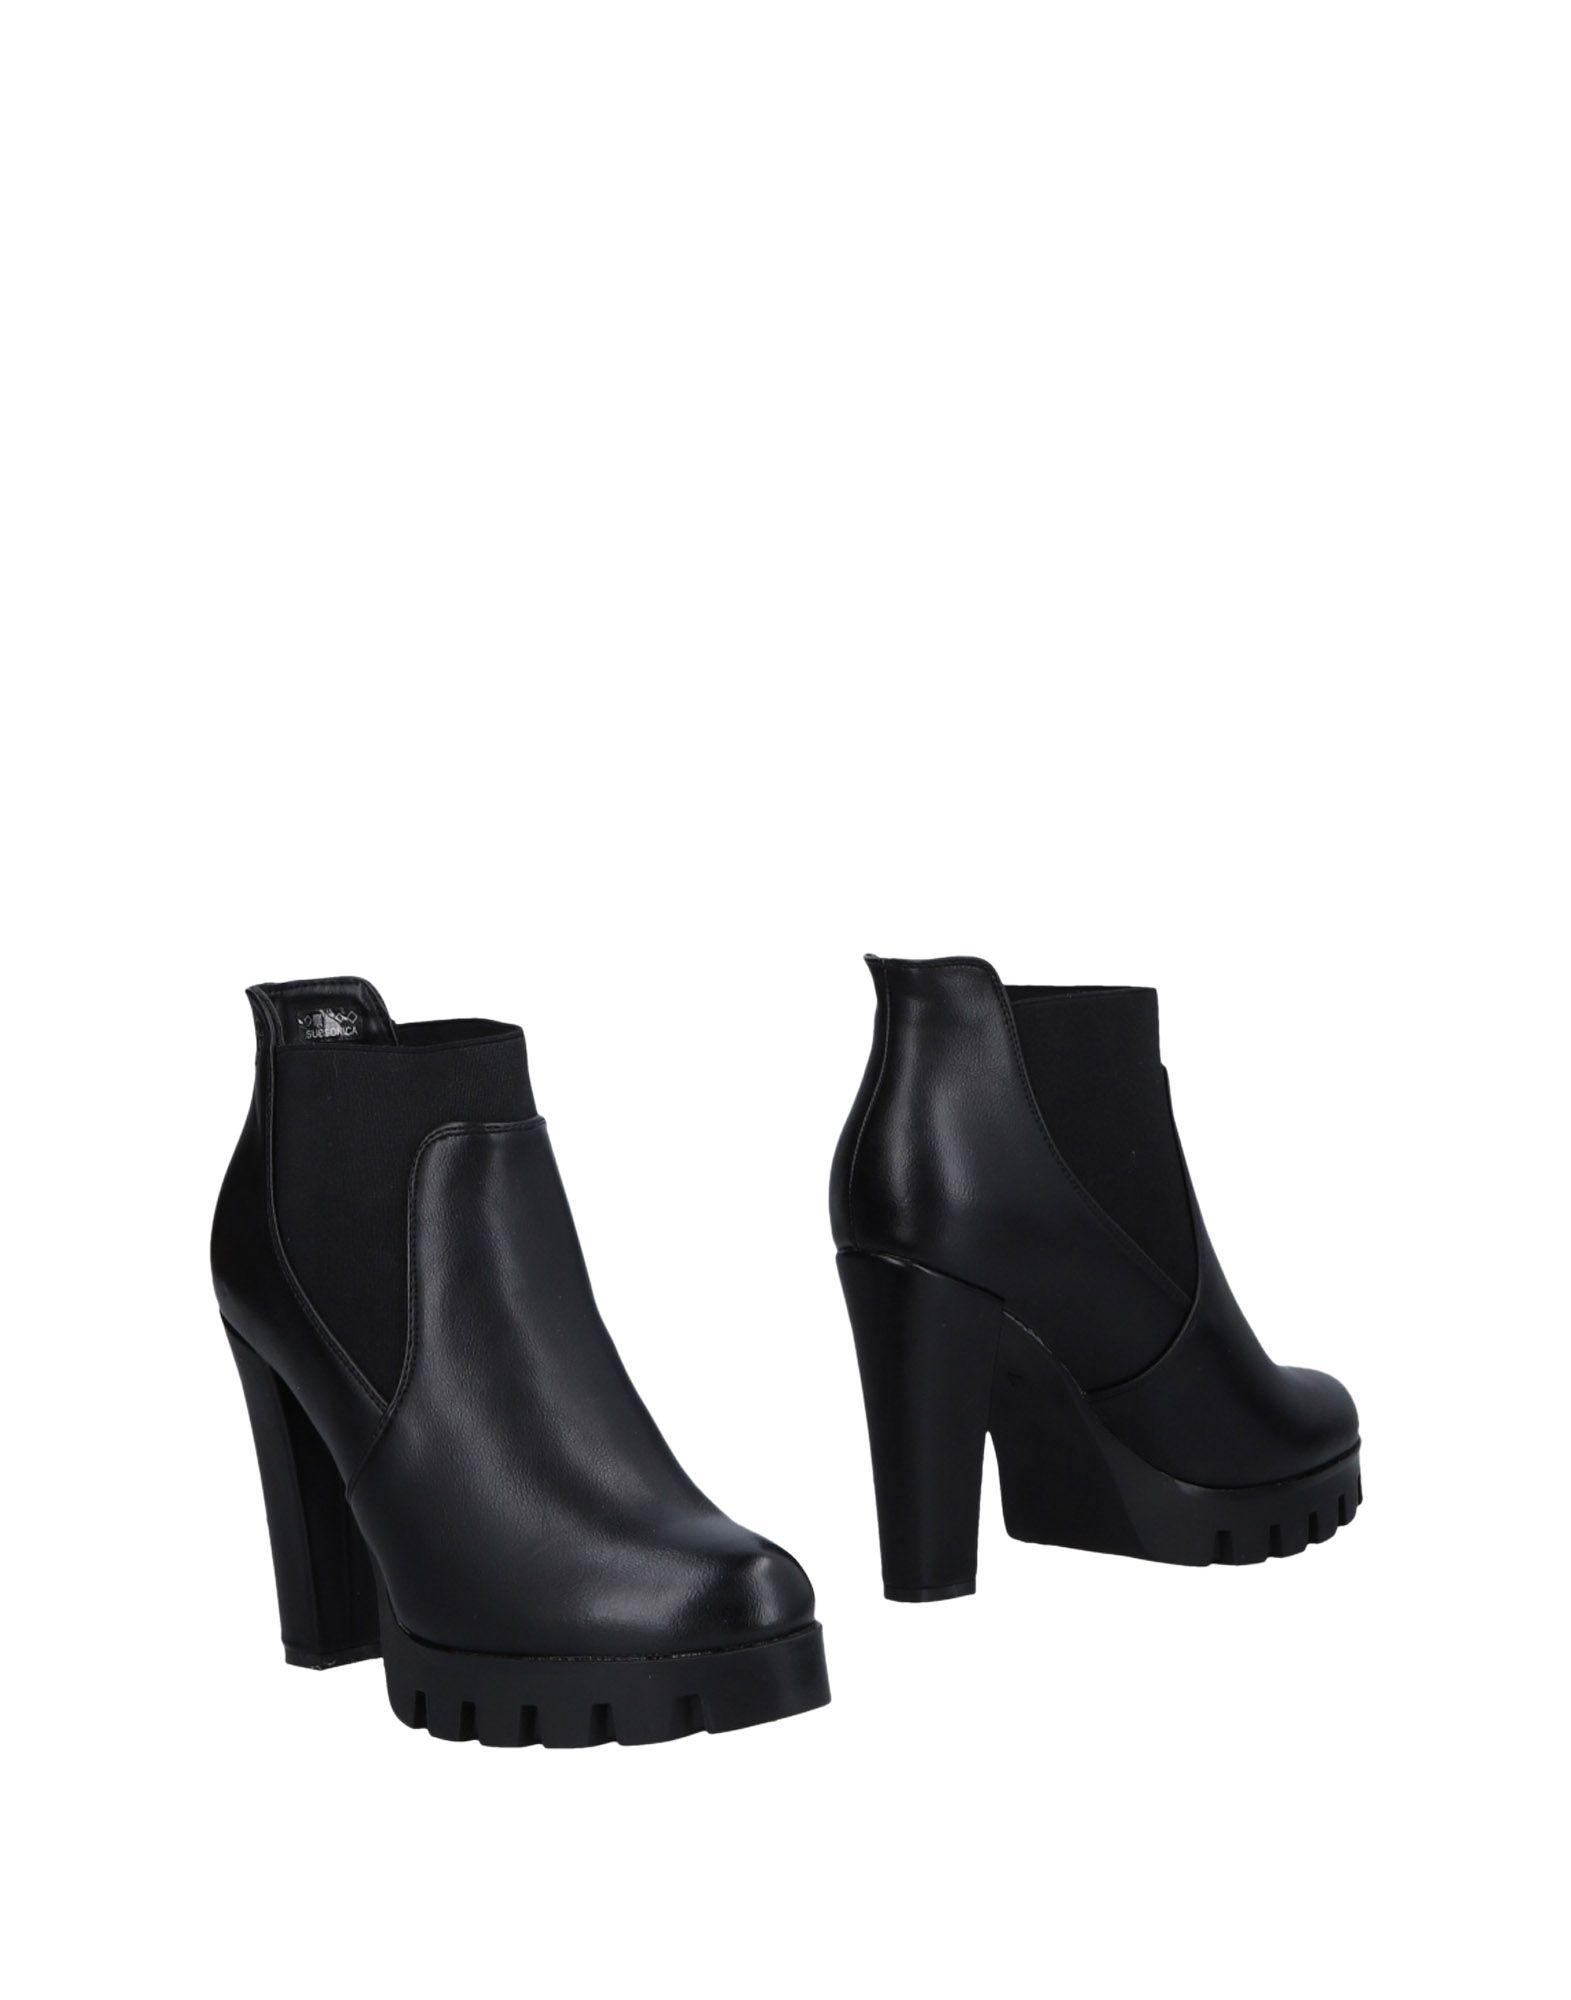 Gut um billige Schuhe Damen zu tragenSandro Ferrone Stiefelette Damen Schuhe  11472357OP 0c632a